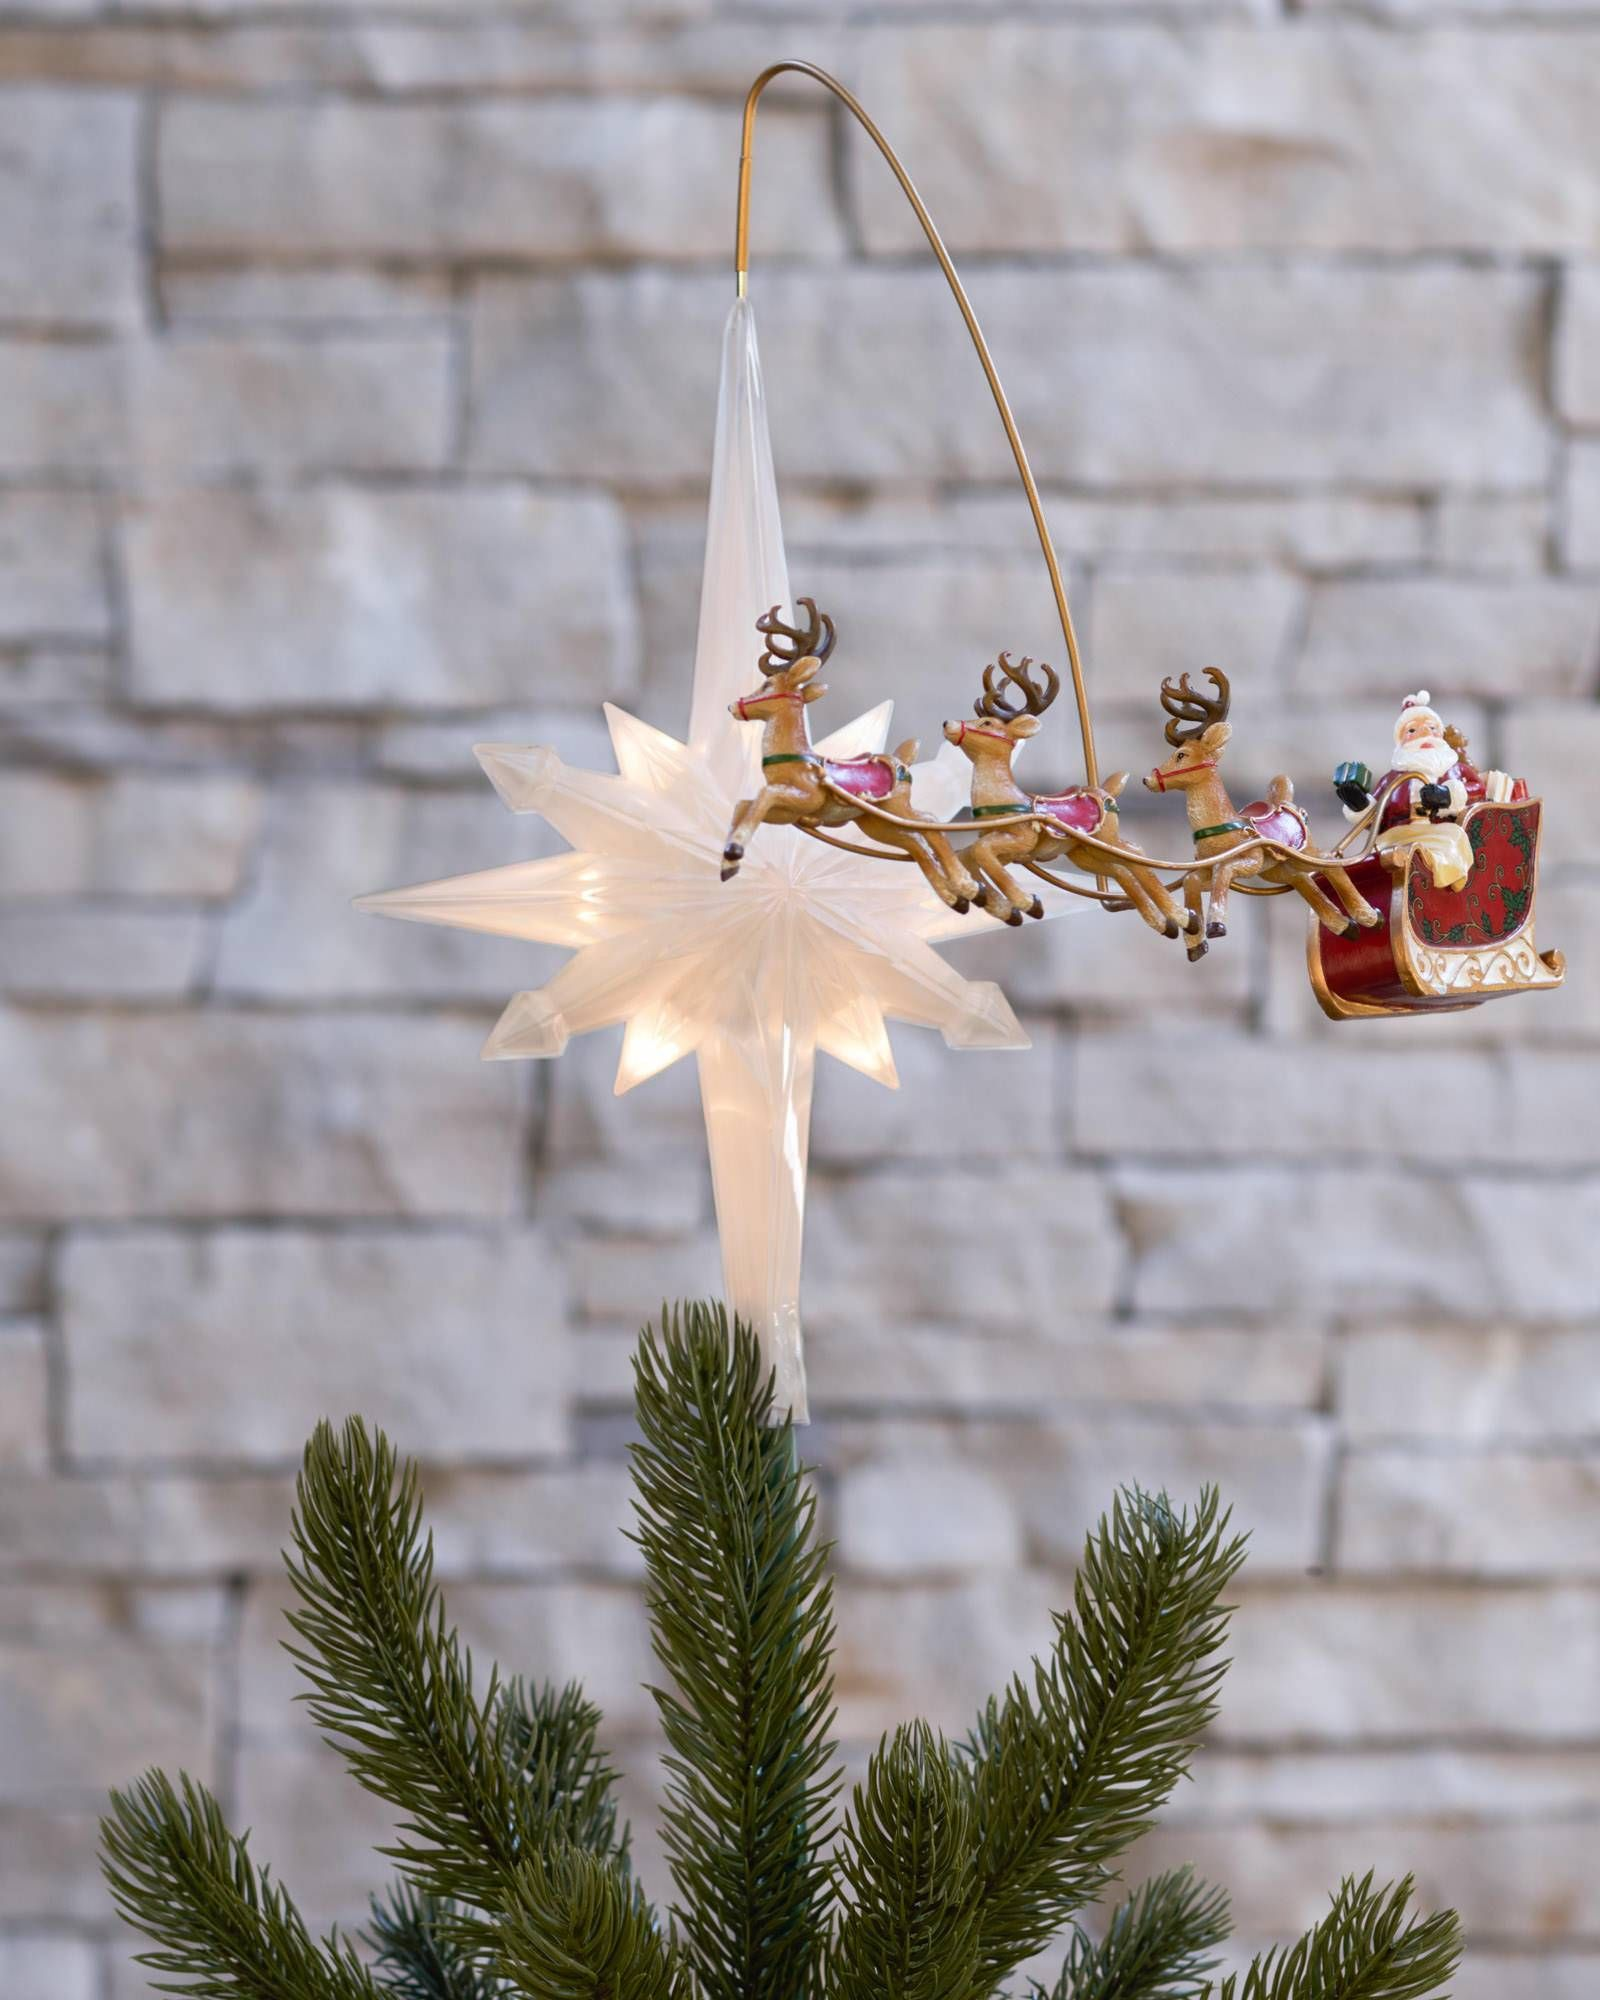 Santa S Sleigh Animated Tree Topper Balsam Hill Animated Christmas Decorations Fun Christmas Decorations Animated Christmas